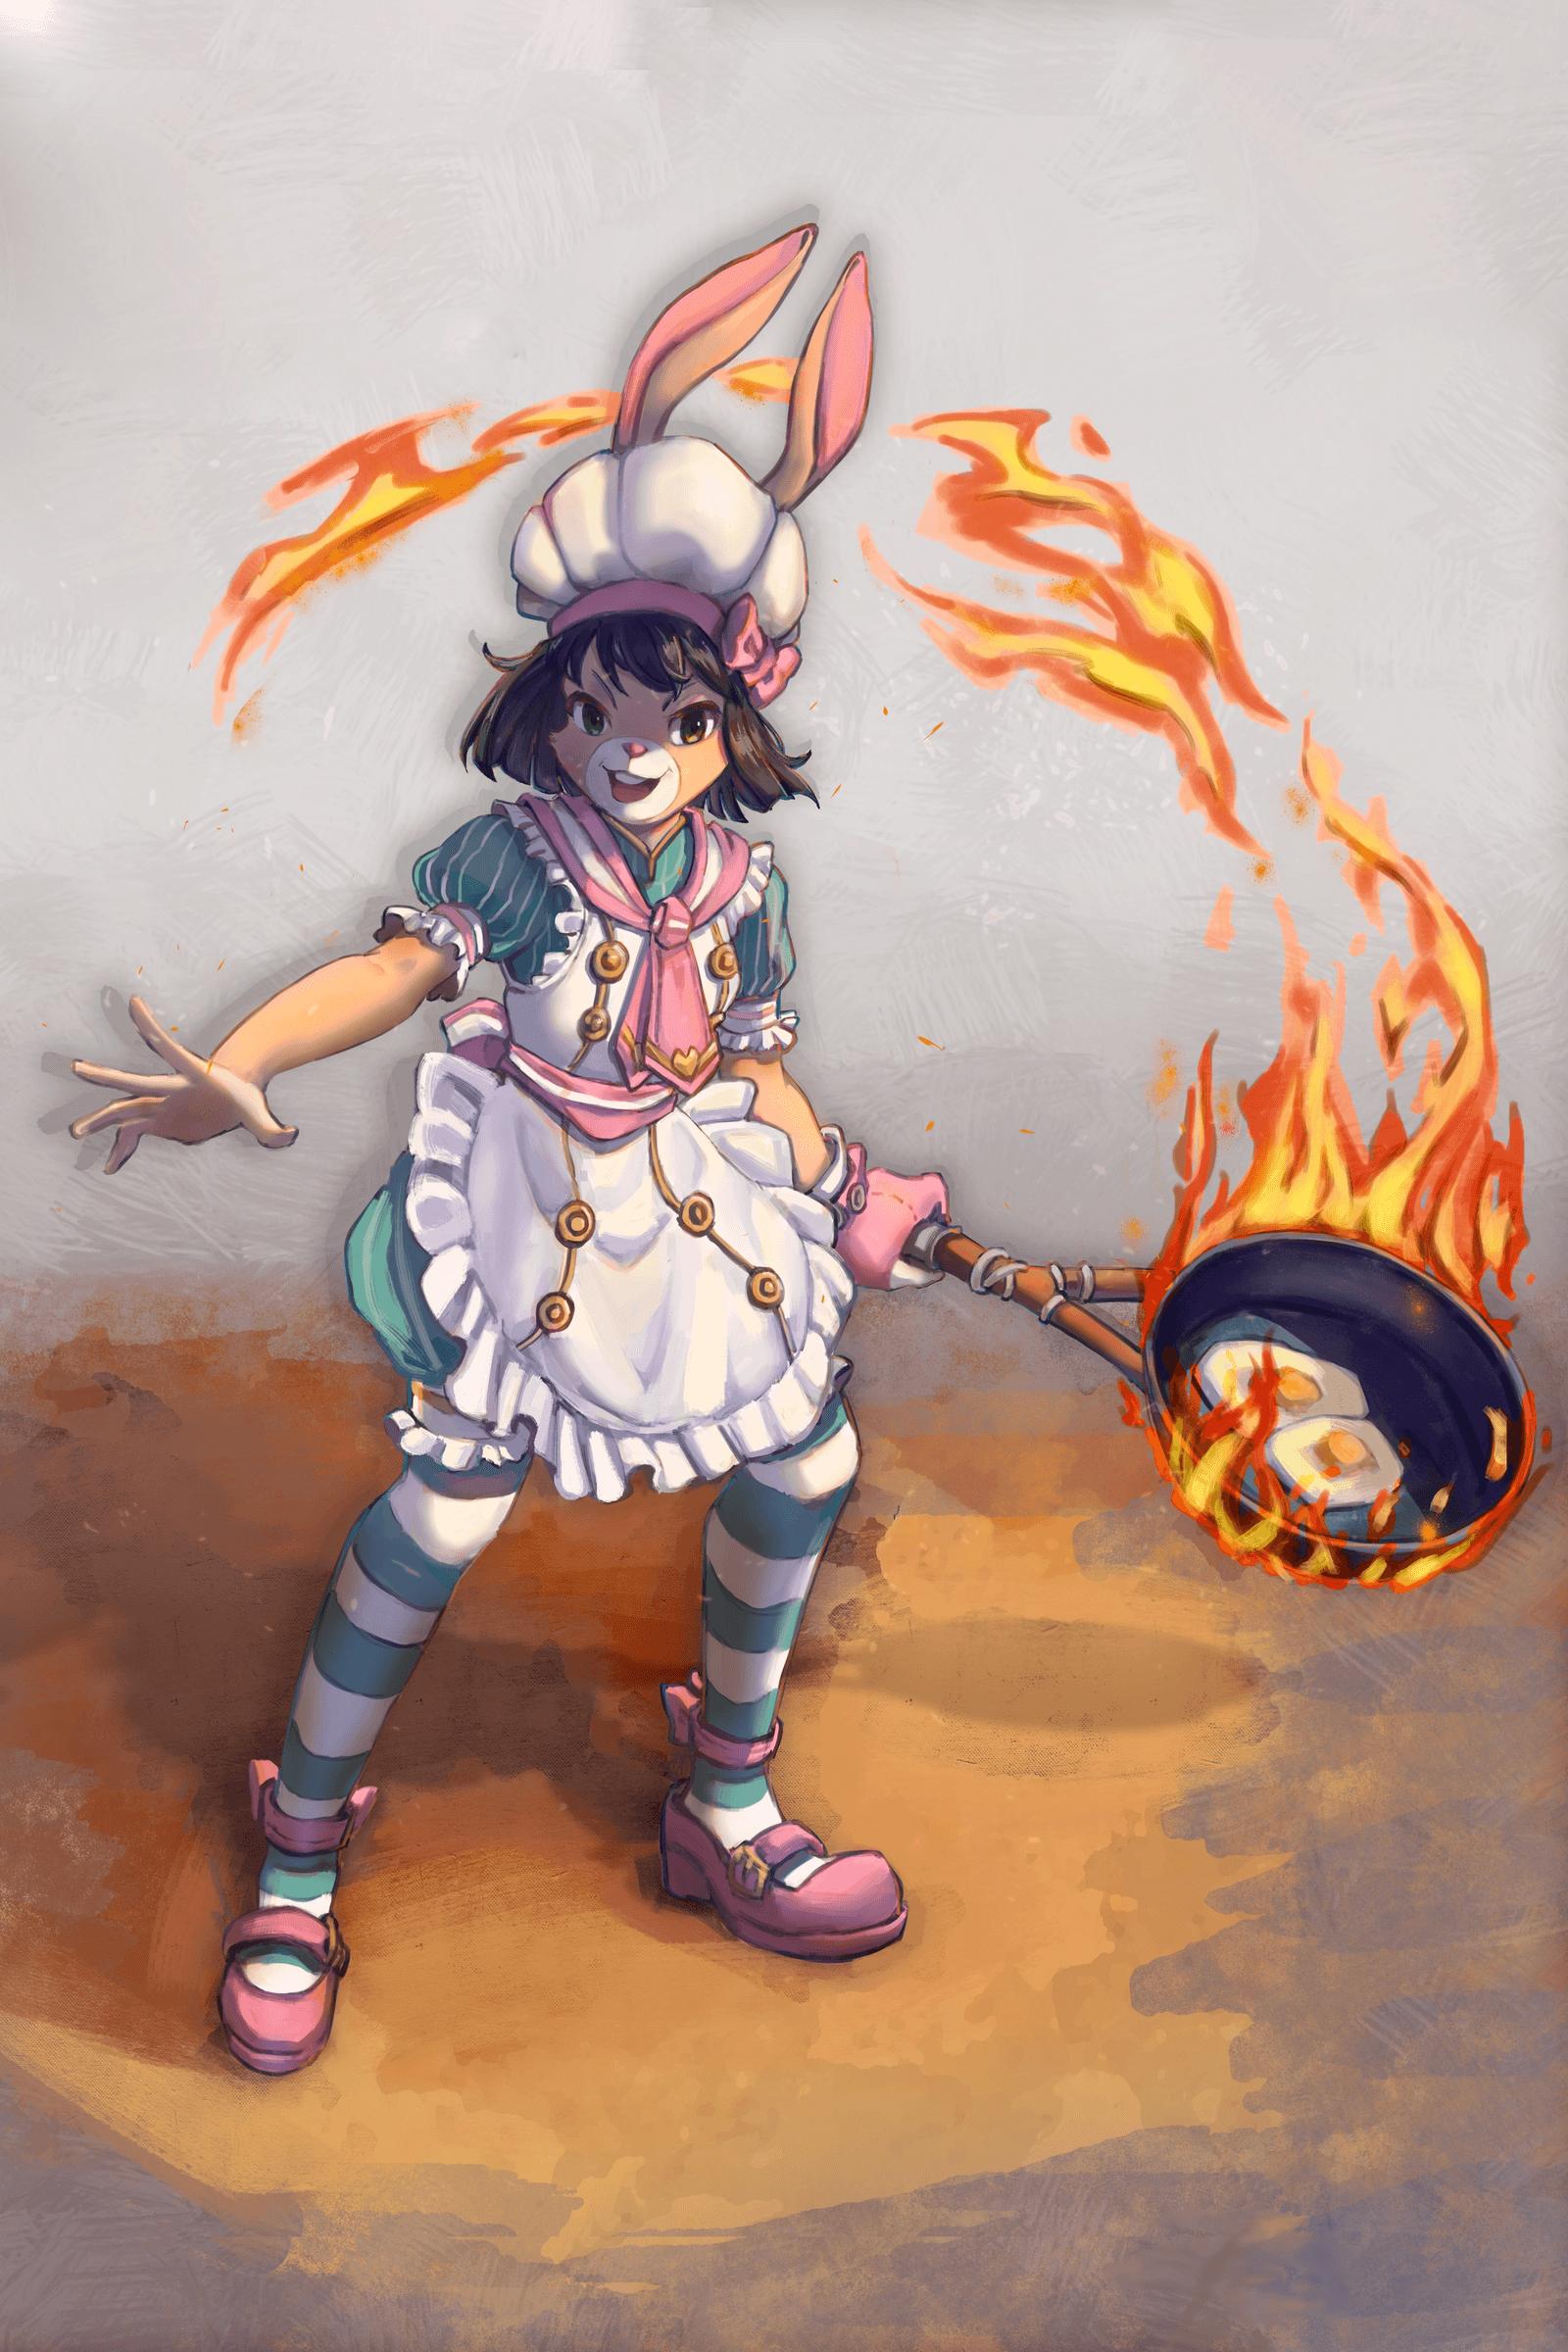 Zoe the Cook